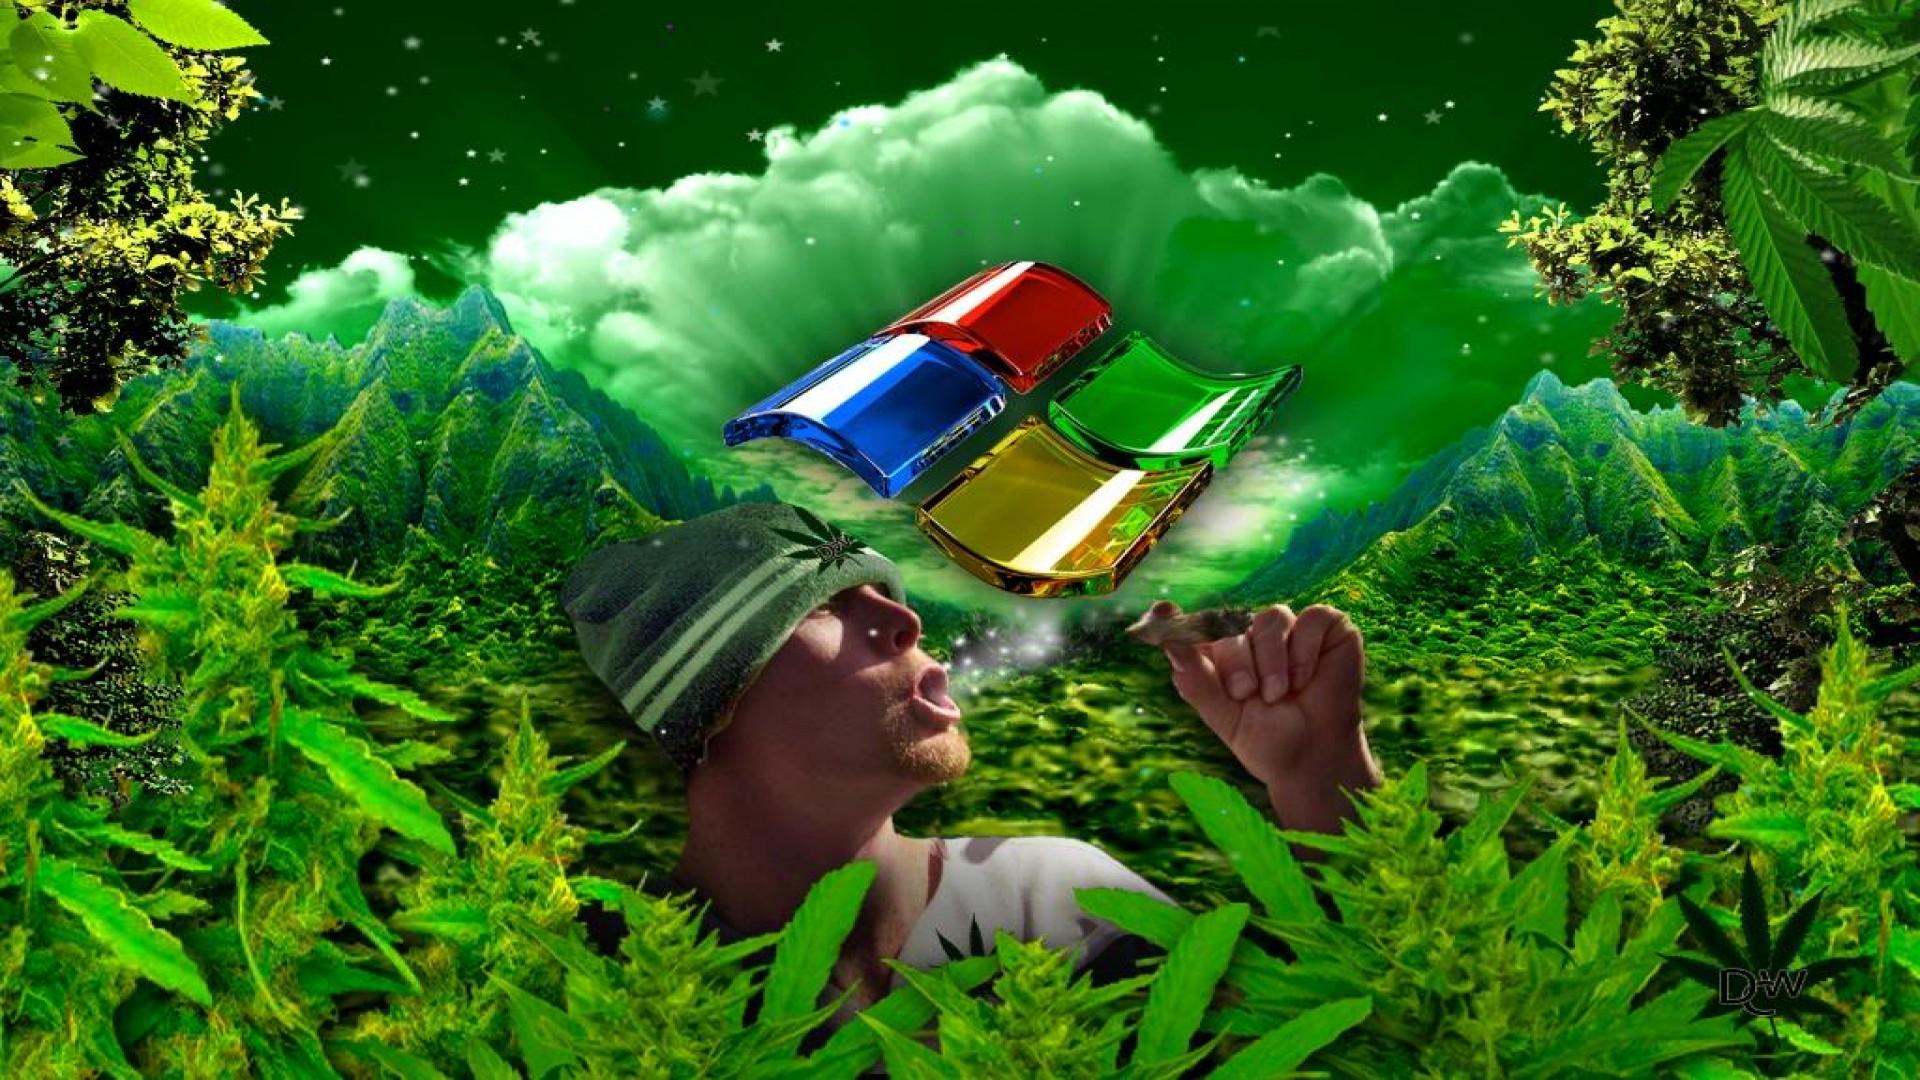 iPhone Marijuana Wallpaper HD - WallpaperSafari